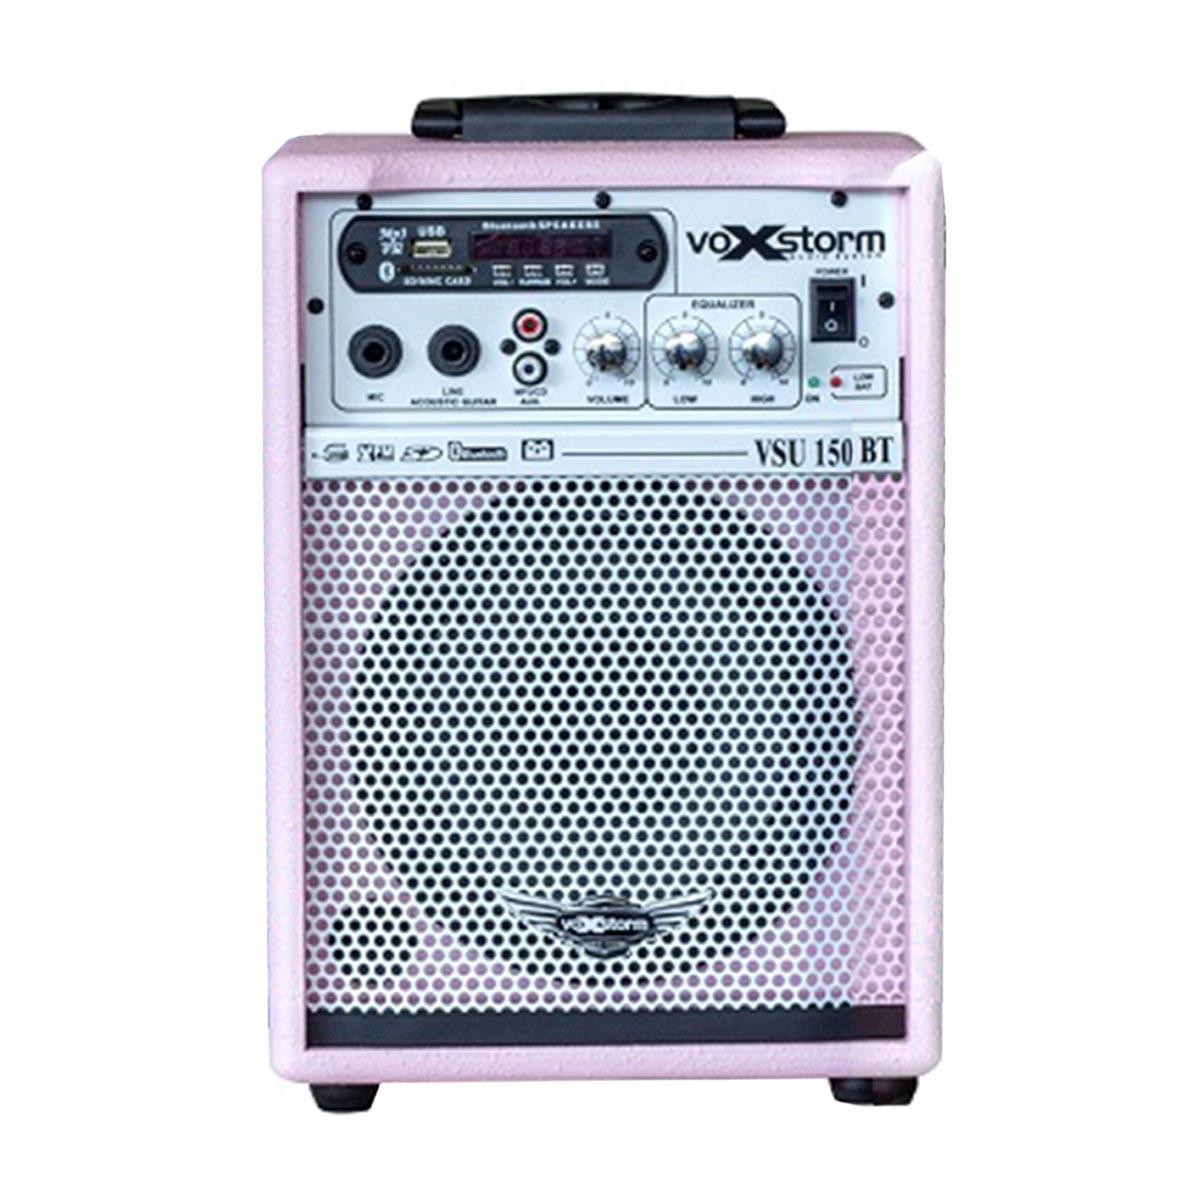 VSU150BT - Cubo Multiuso Ativo 15W c/ Bateria Interna, Bluetooth e USB VSU 150 BT Rosa - Voxstorm